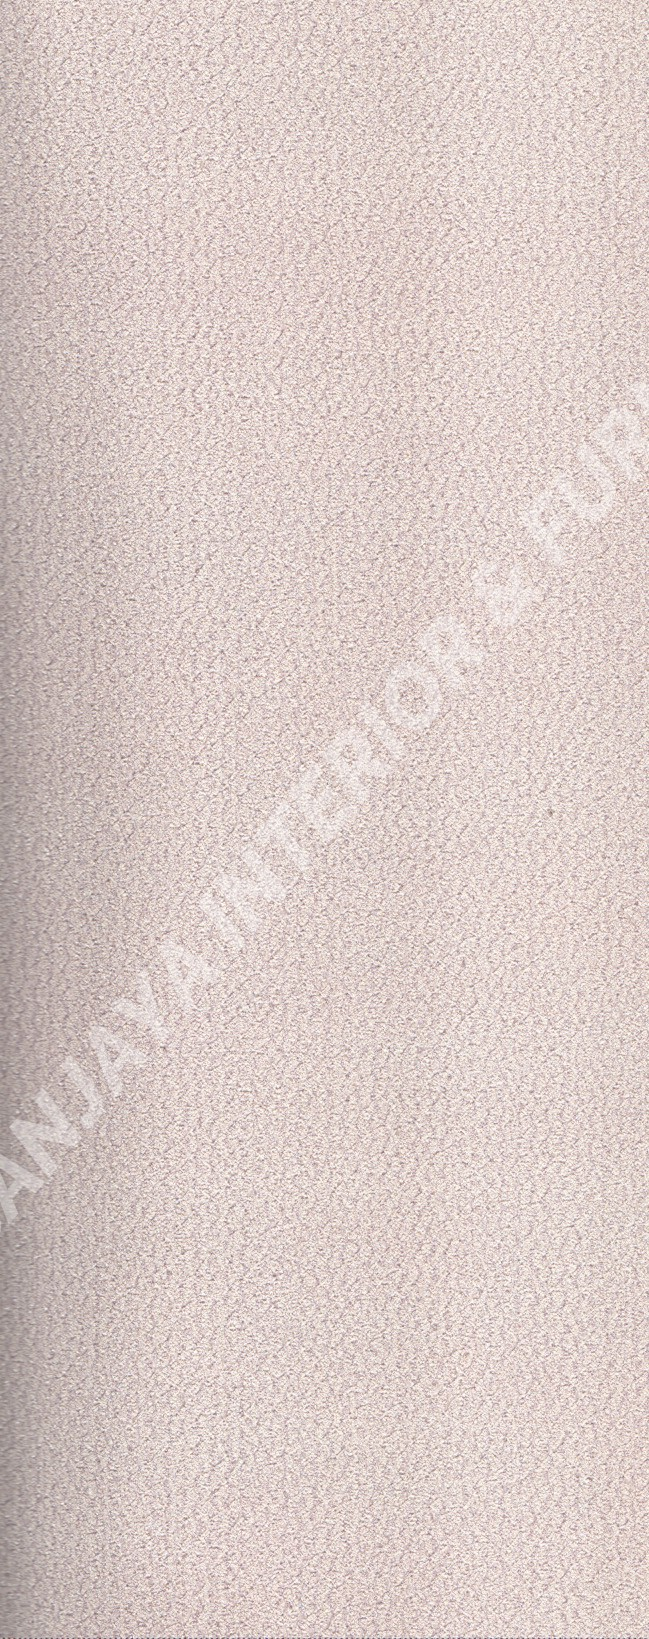 wallpaper   Wallpaper Minimalis Polos 5015-3:5015-3 corak  warna